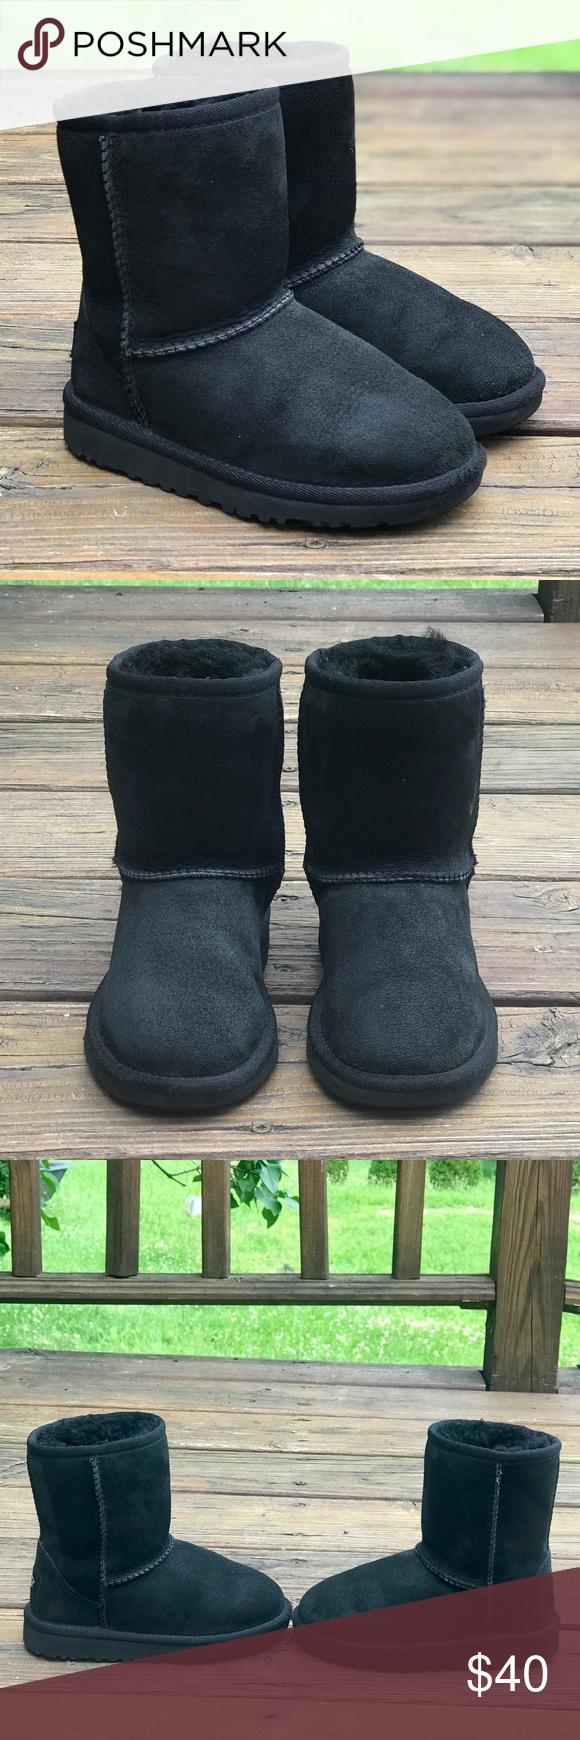 Girls Short Black UGG Boots b649e0f88